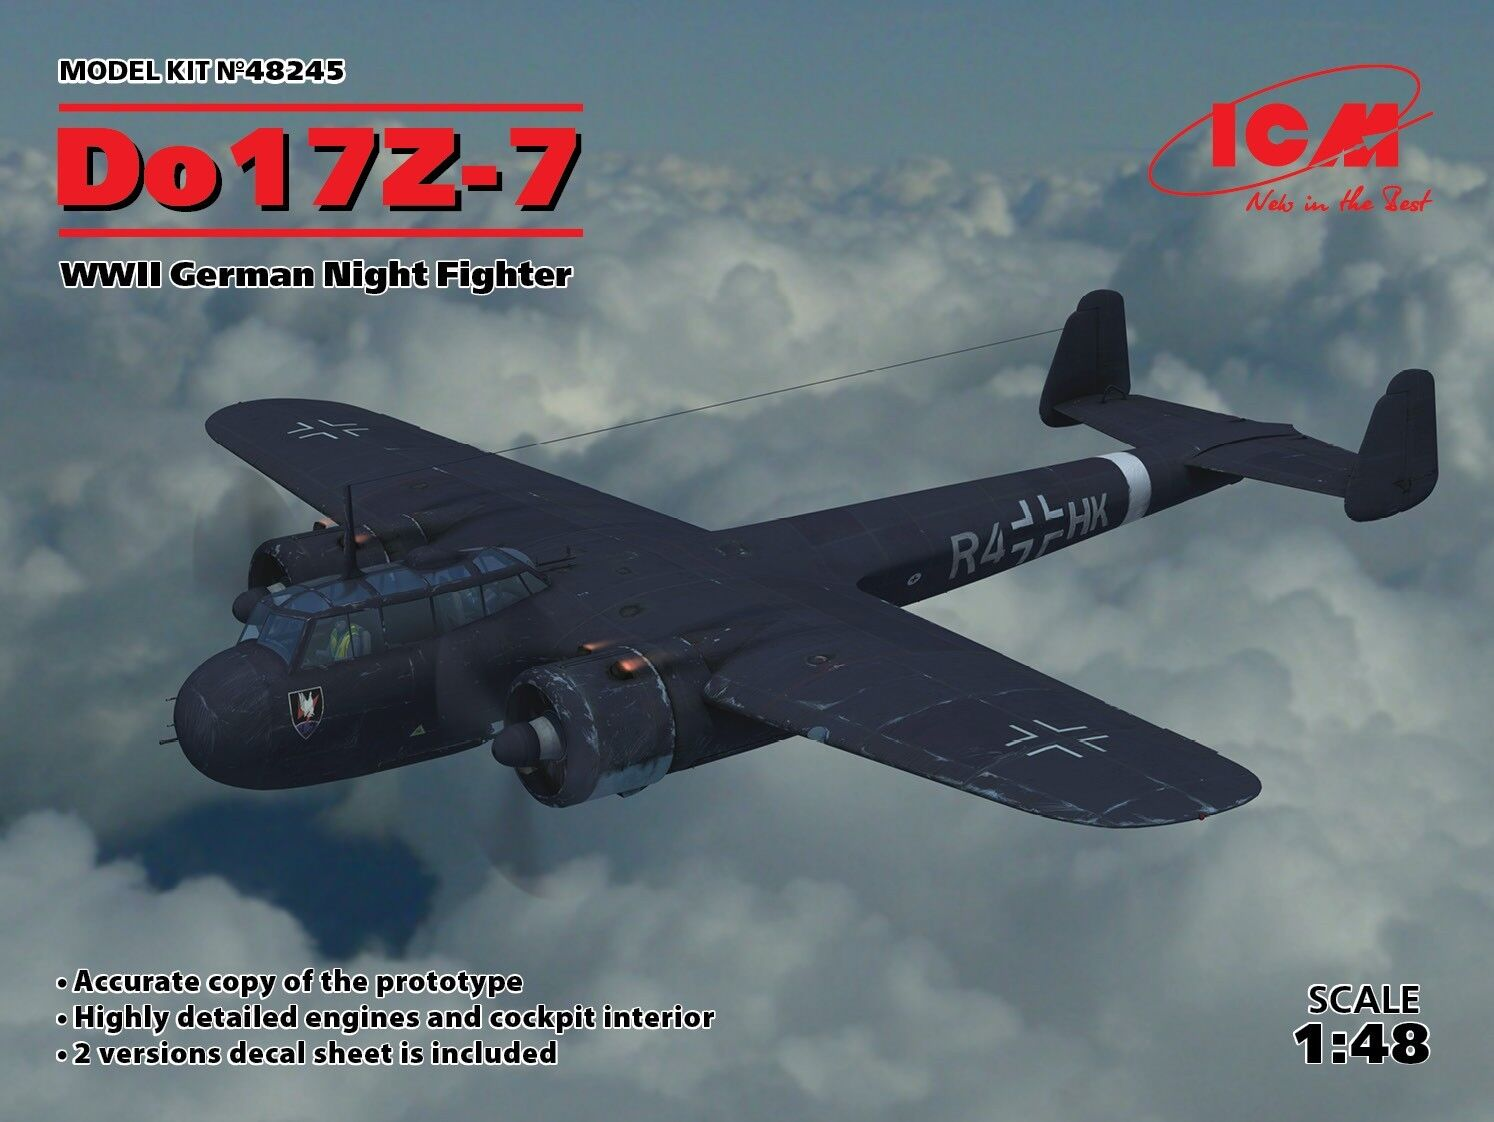 ofreciendo 100% Icm 1 48 Dornier Do-17Z-7 Seconda Seconda Seconda Guerra Mondiale Tedesco Notte Fighter  48245  suministro de productos de calidad